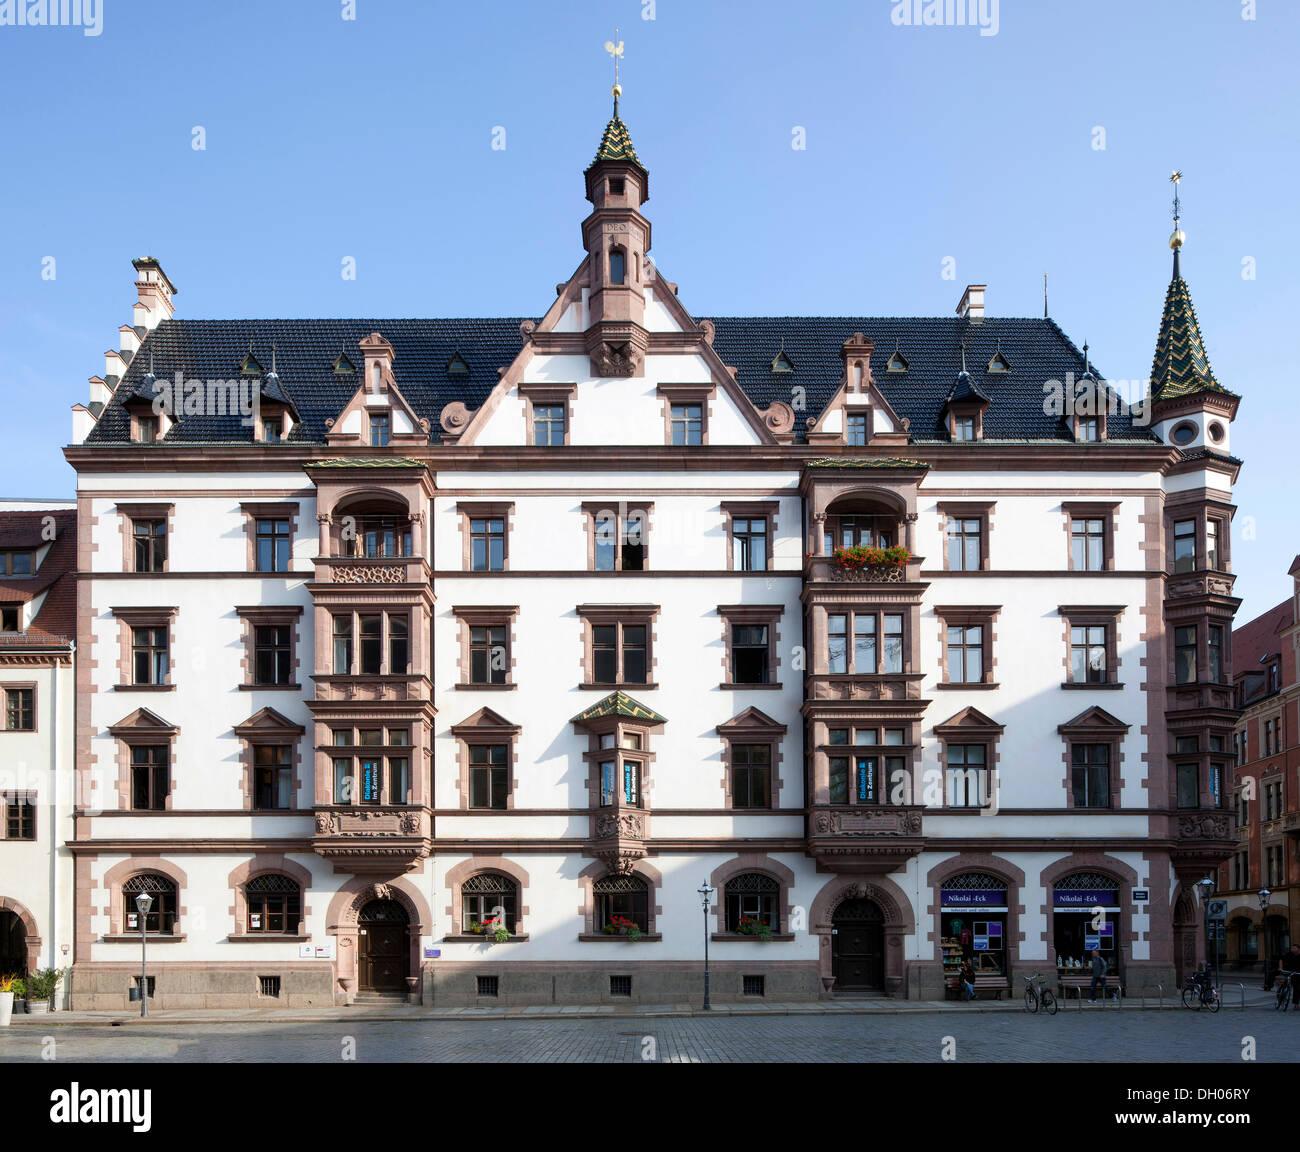 Predigerhaus building, Leipzig, Saxony, PublicGround - Stock Image